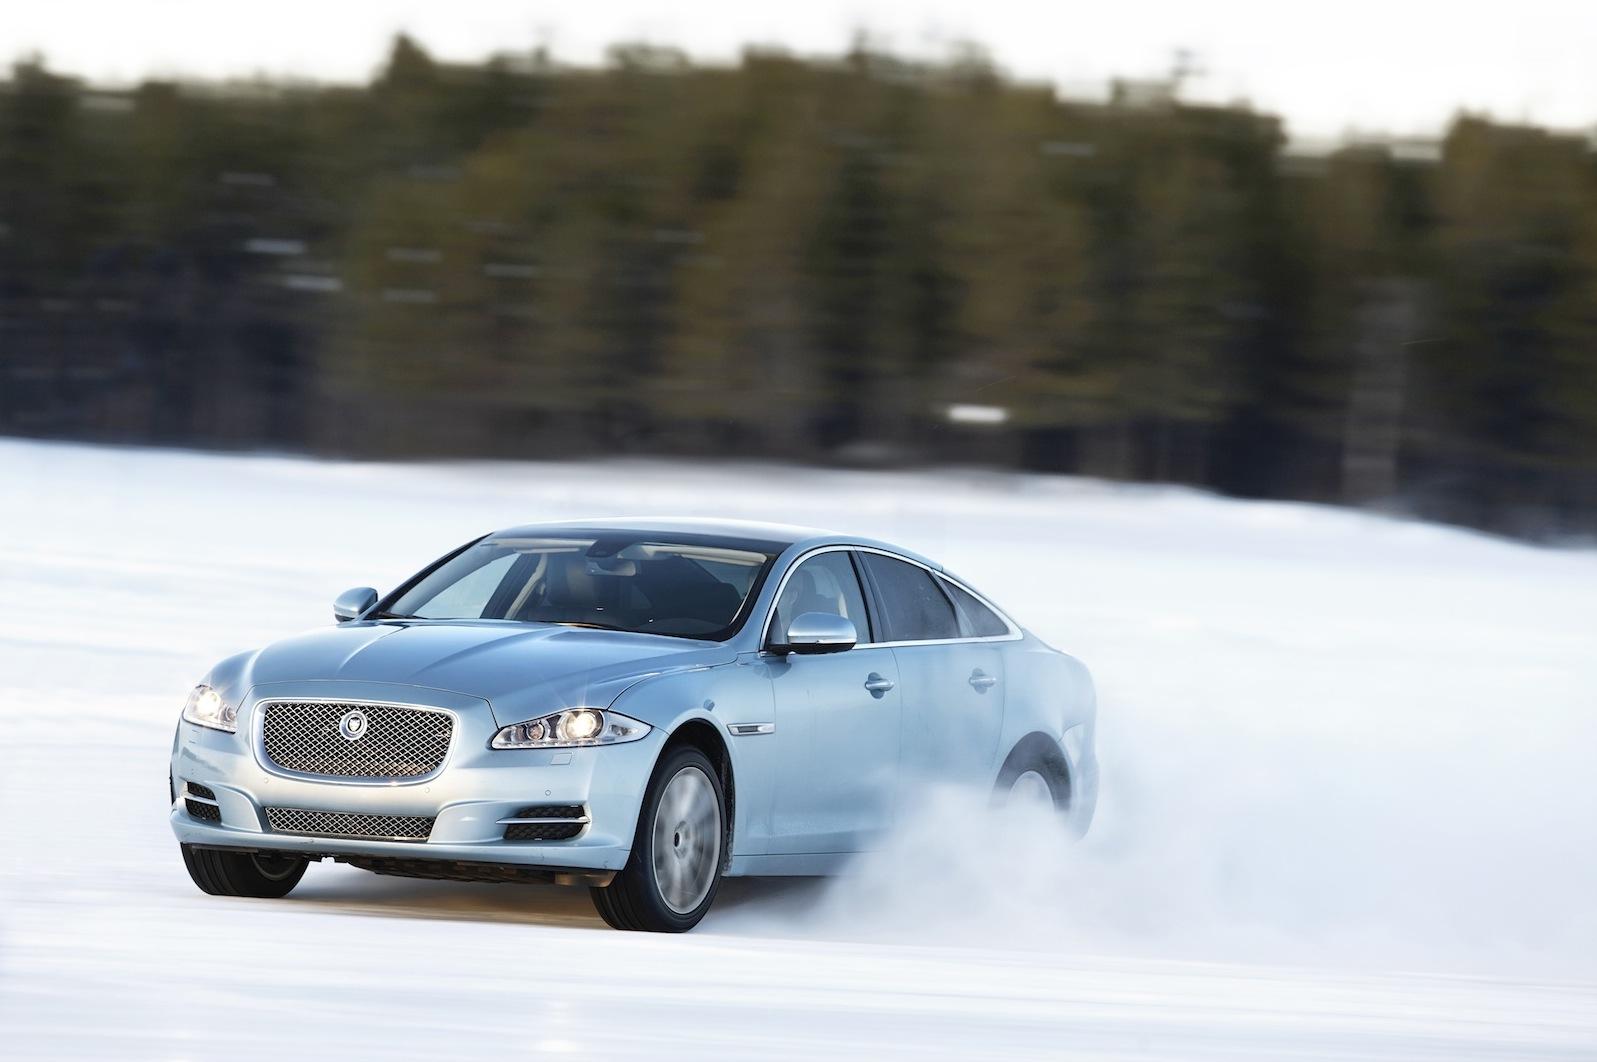 s supersport car review price jaguar original xjl and driver reviews photo test